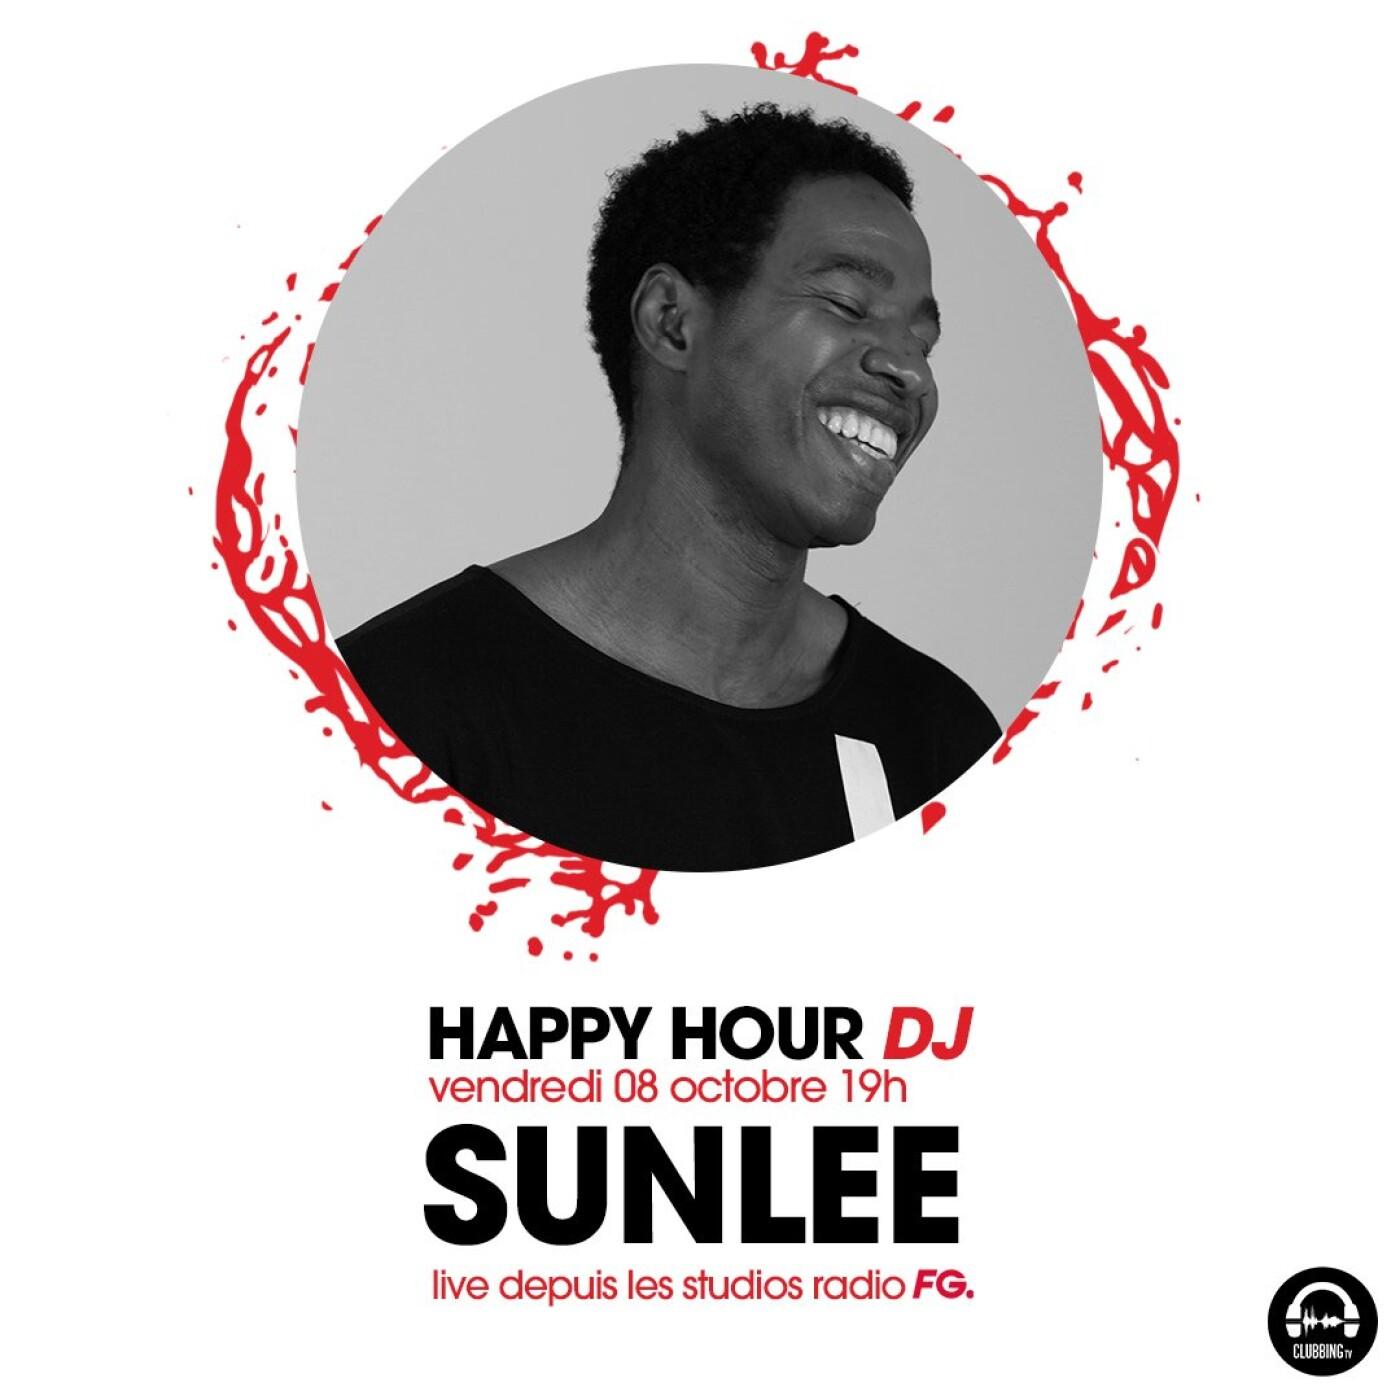 HAPPY HOUR DJ : SUNLEE